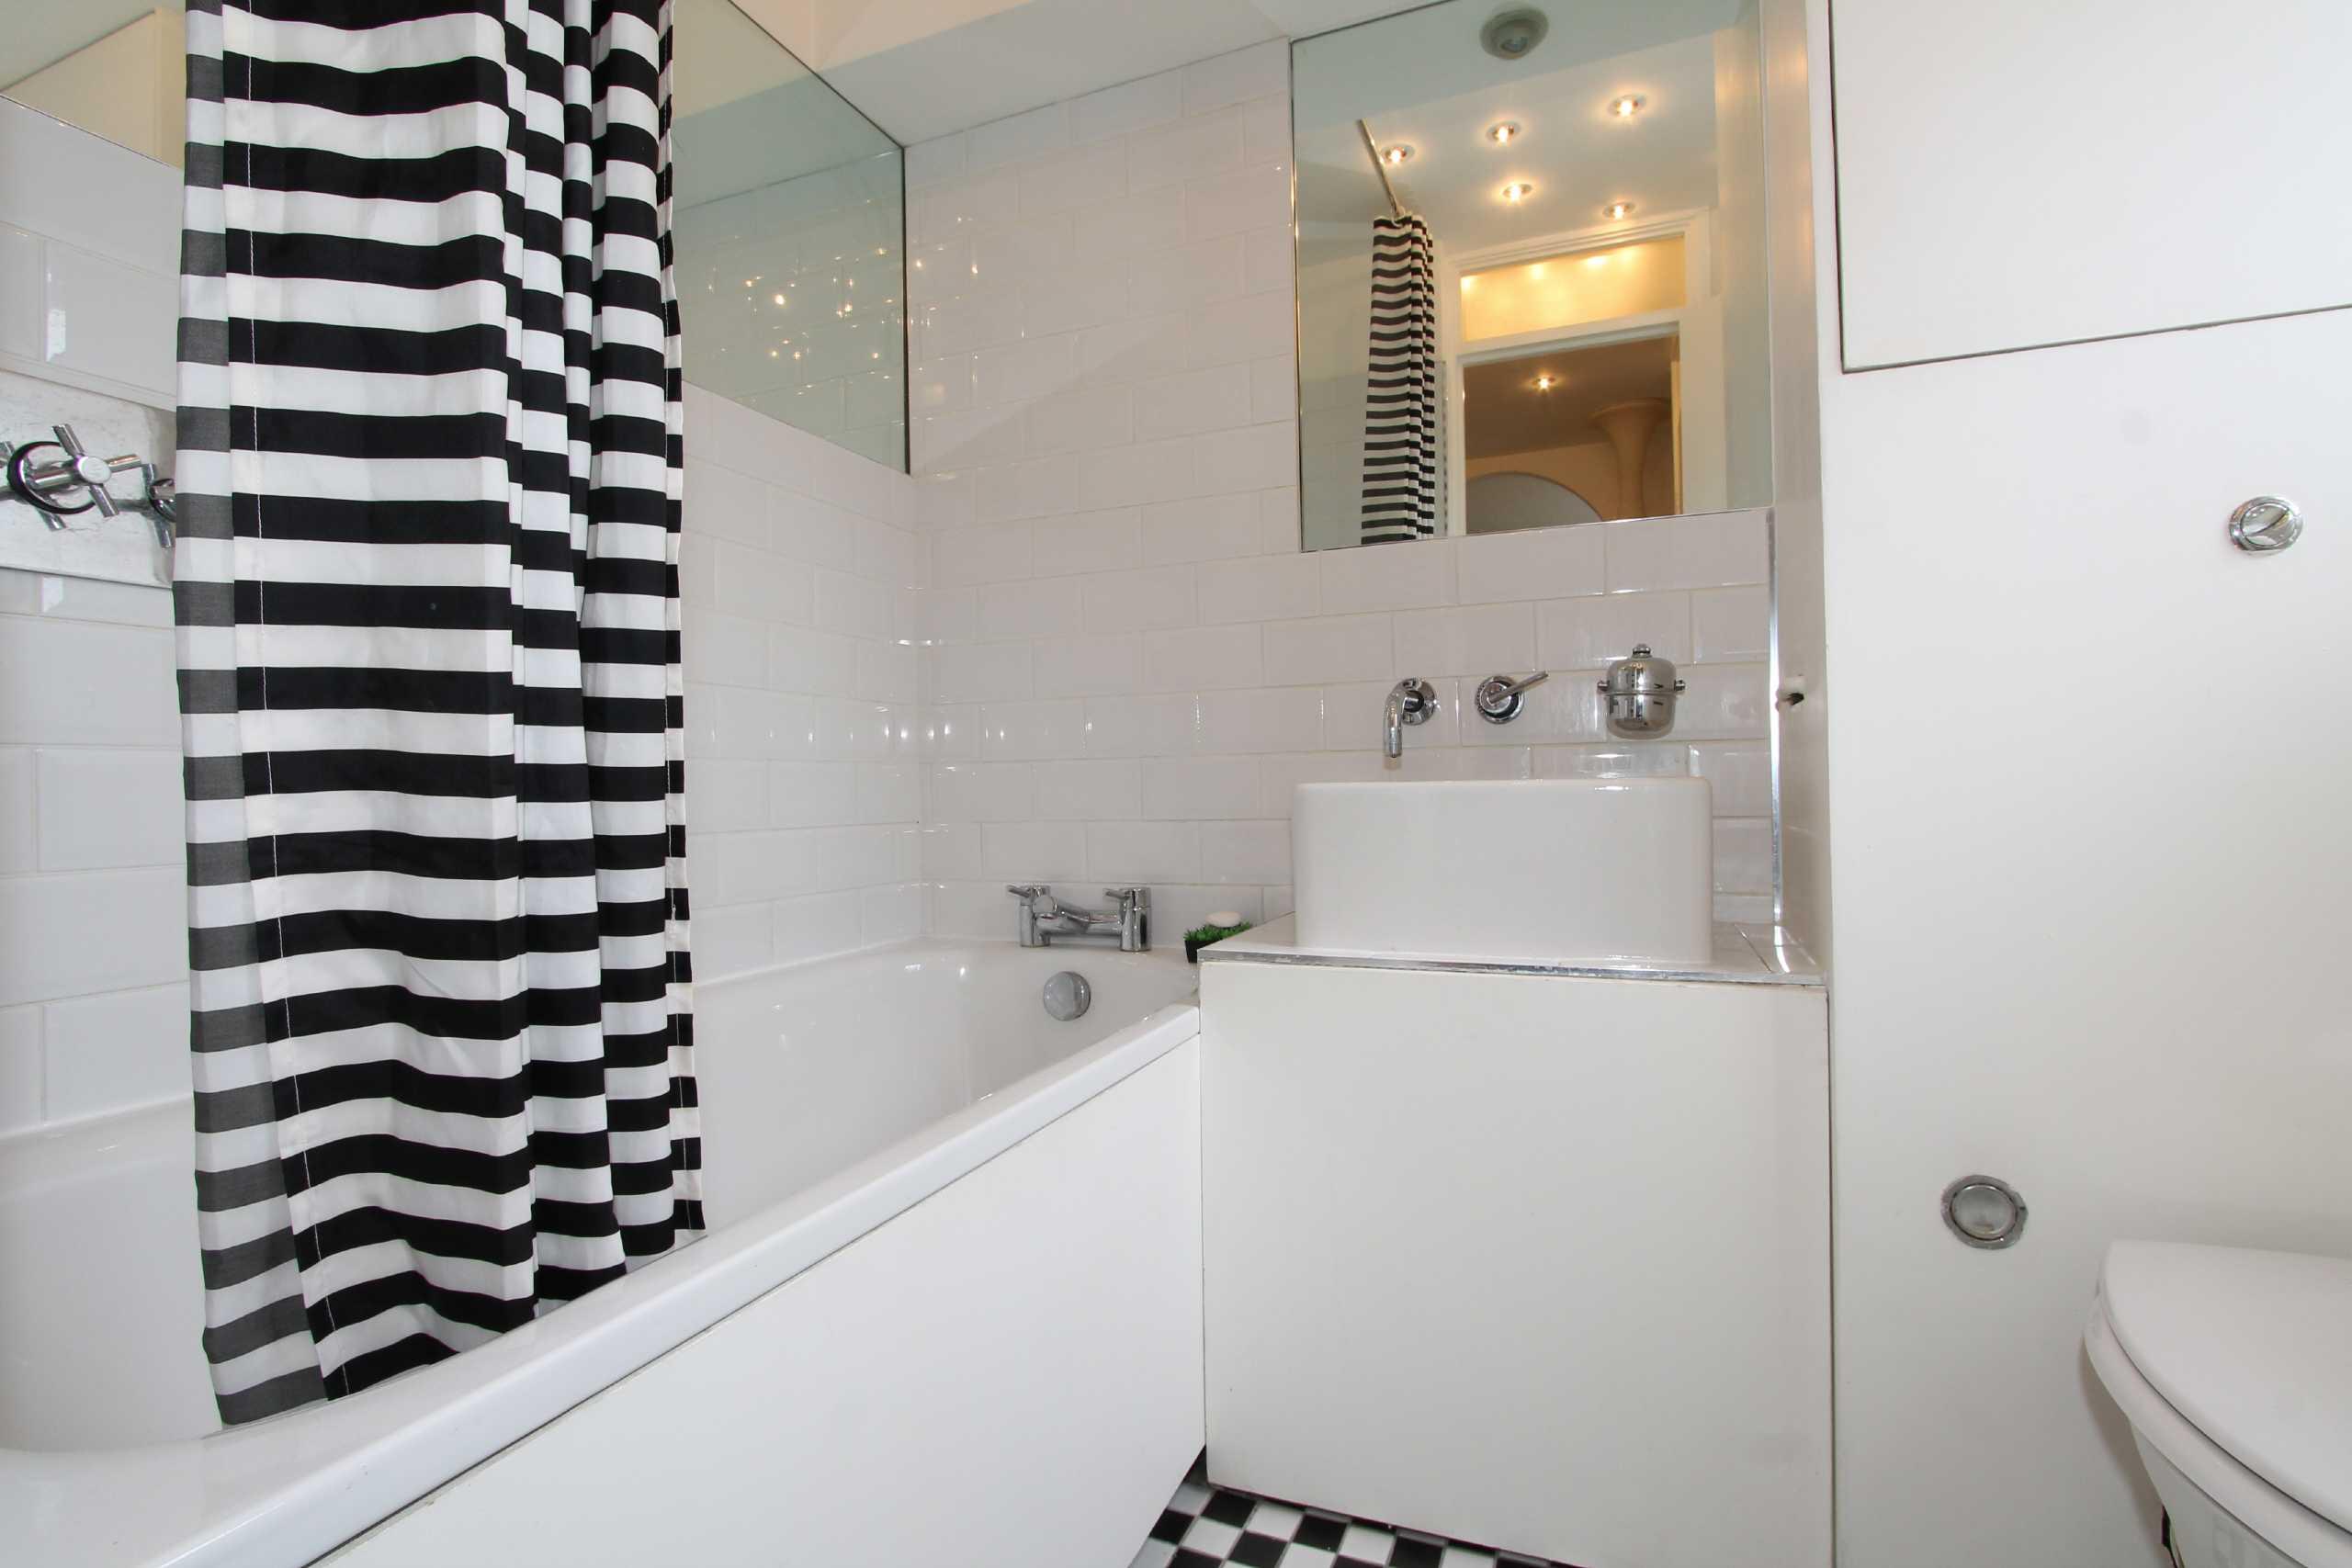 appartamenti londra birck lane bth